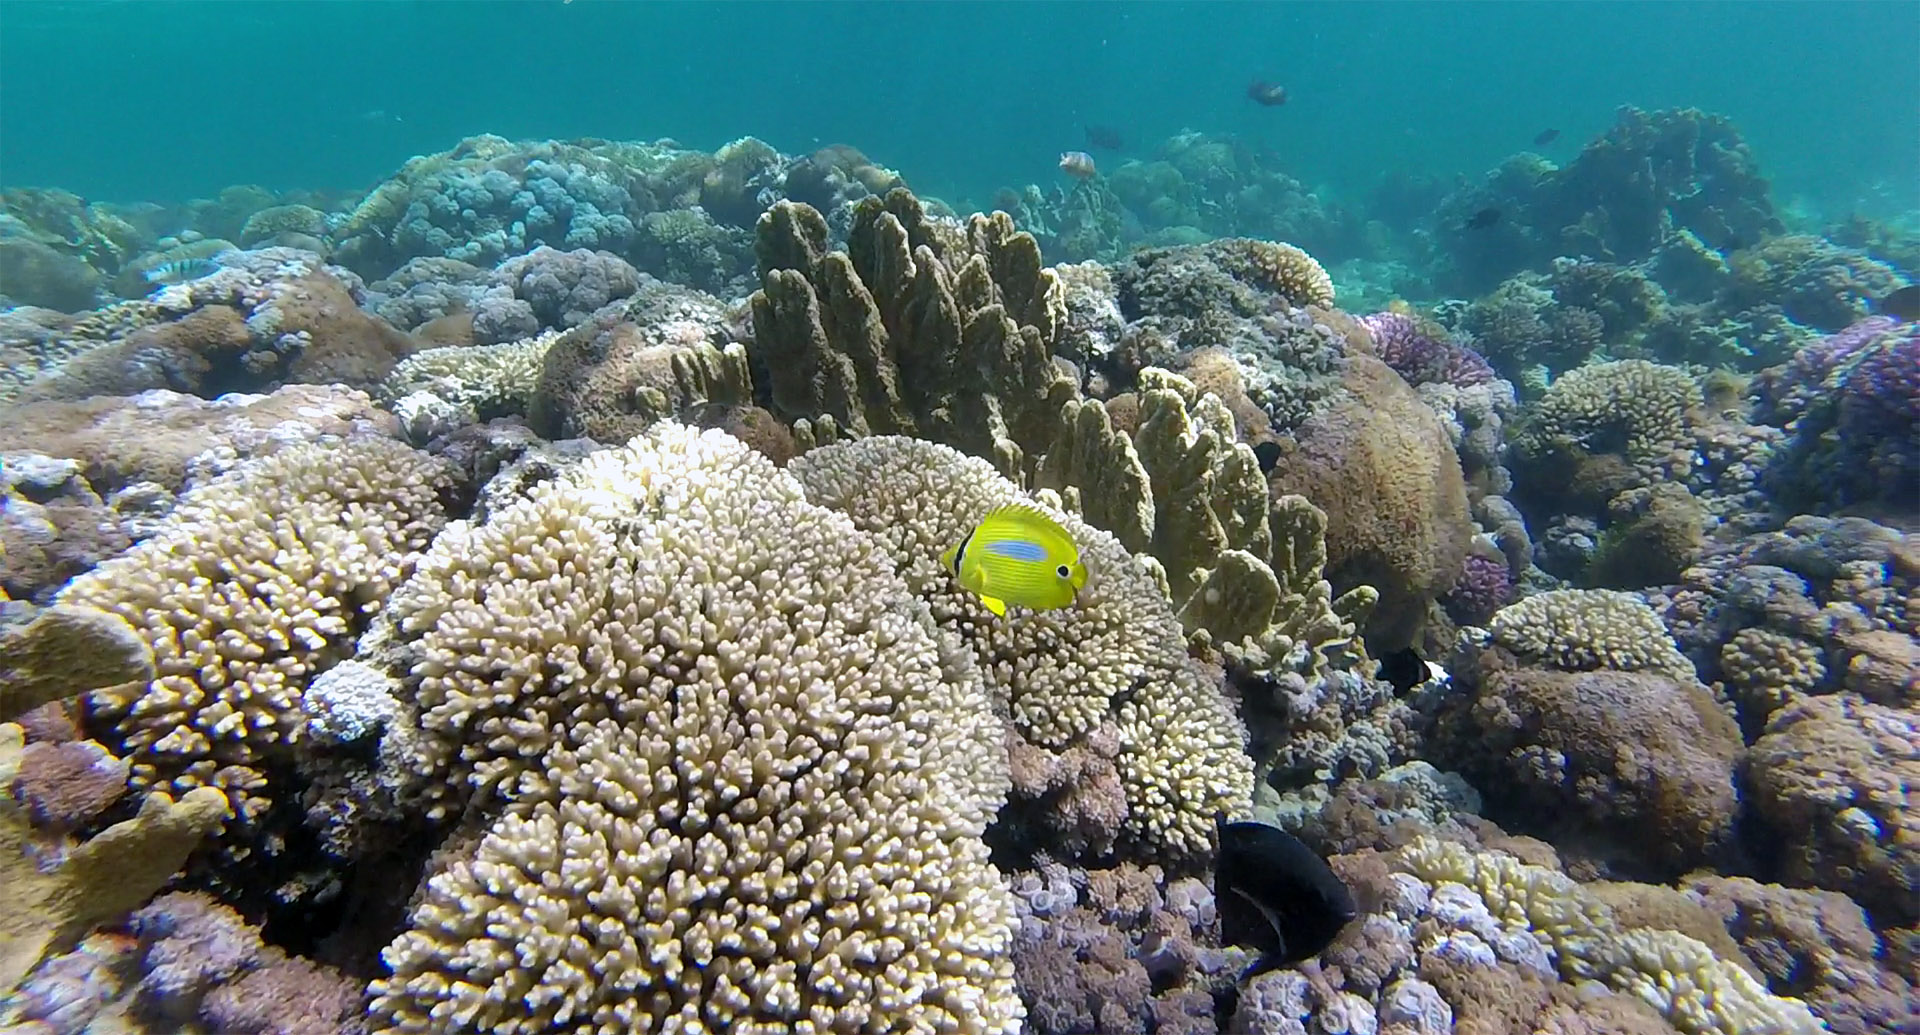 Blue spot butterflyfish